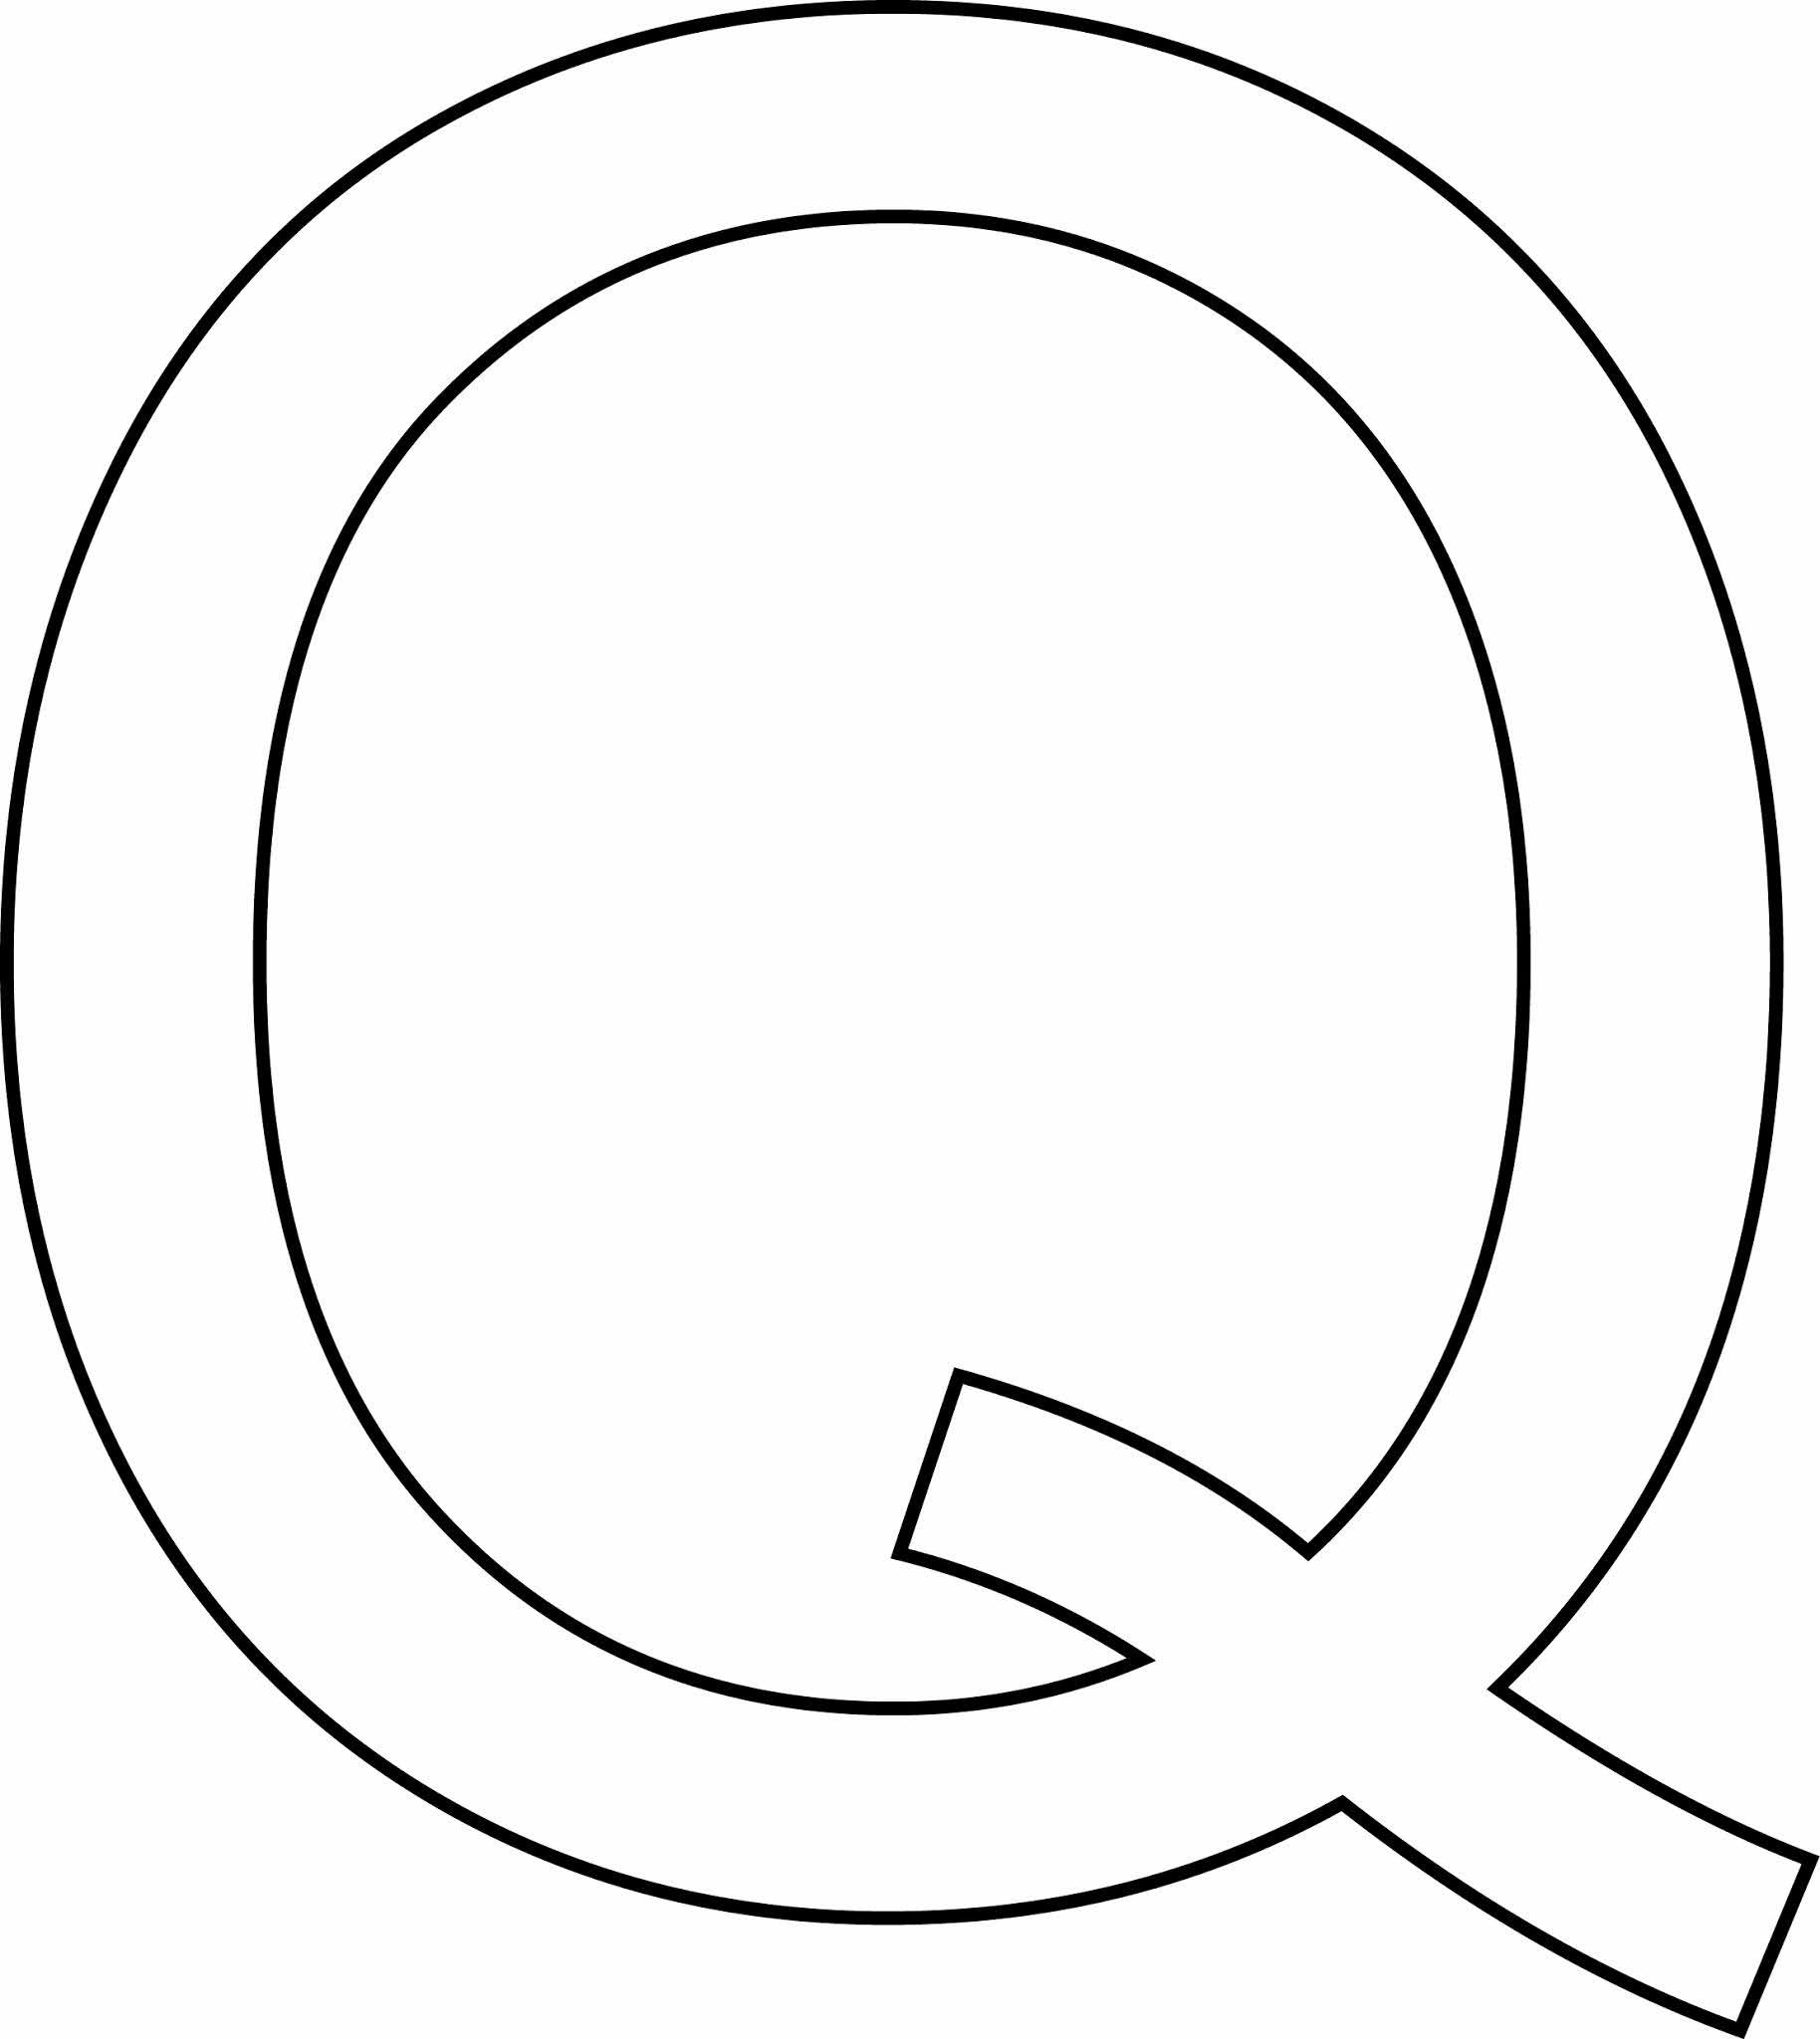 Letra Q - maiúscula para imprimir